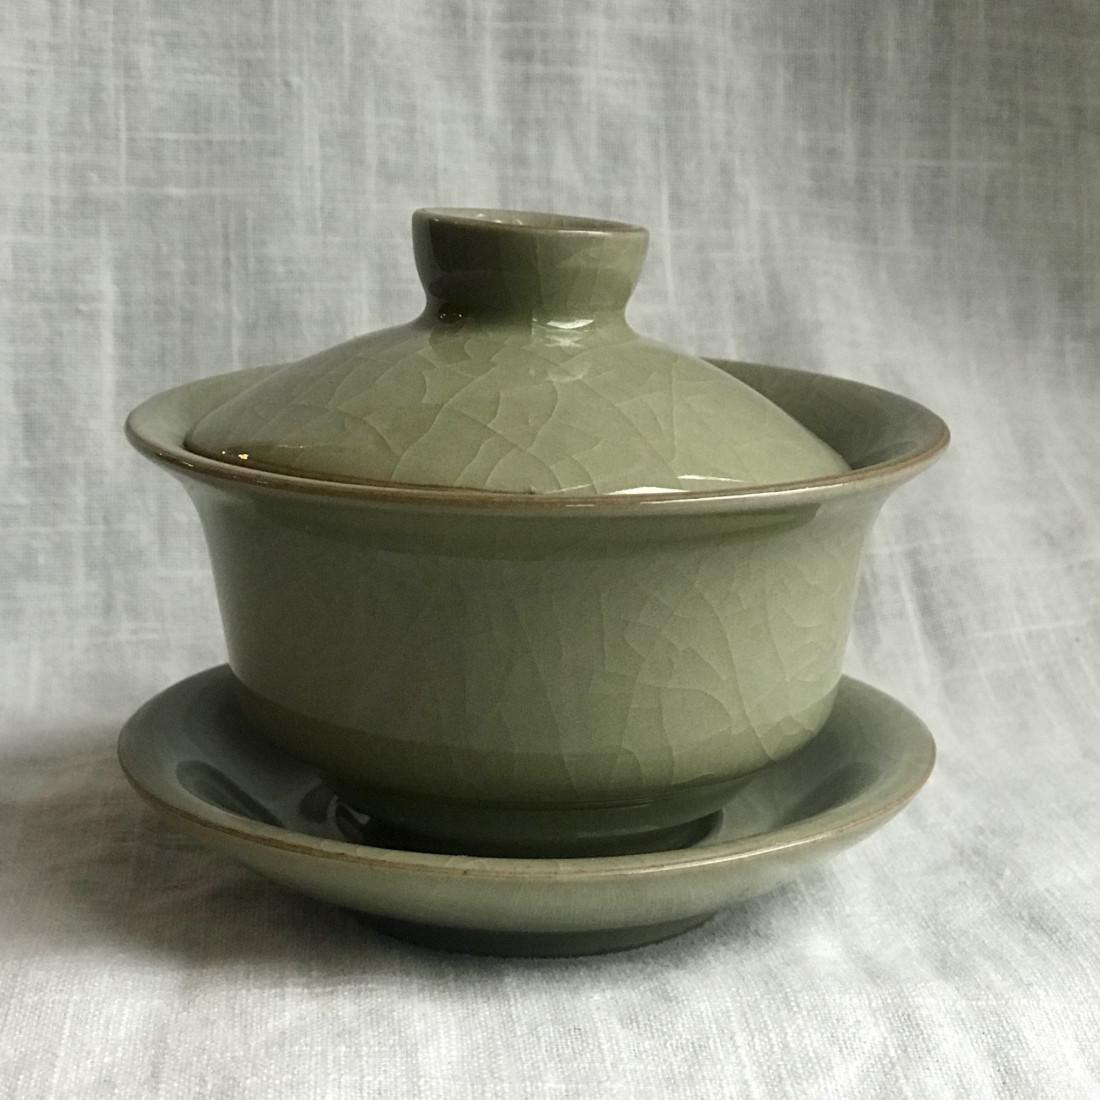 Гайвань из гэяо цвета желтого риса